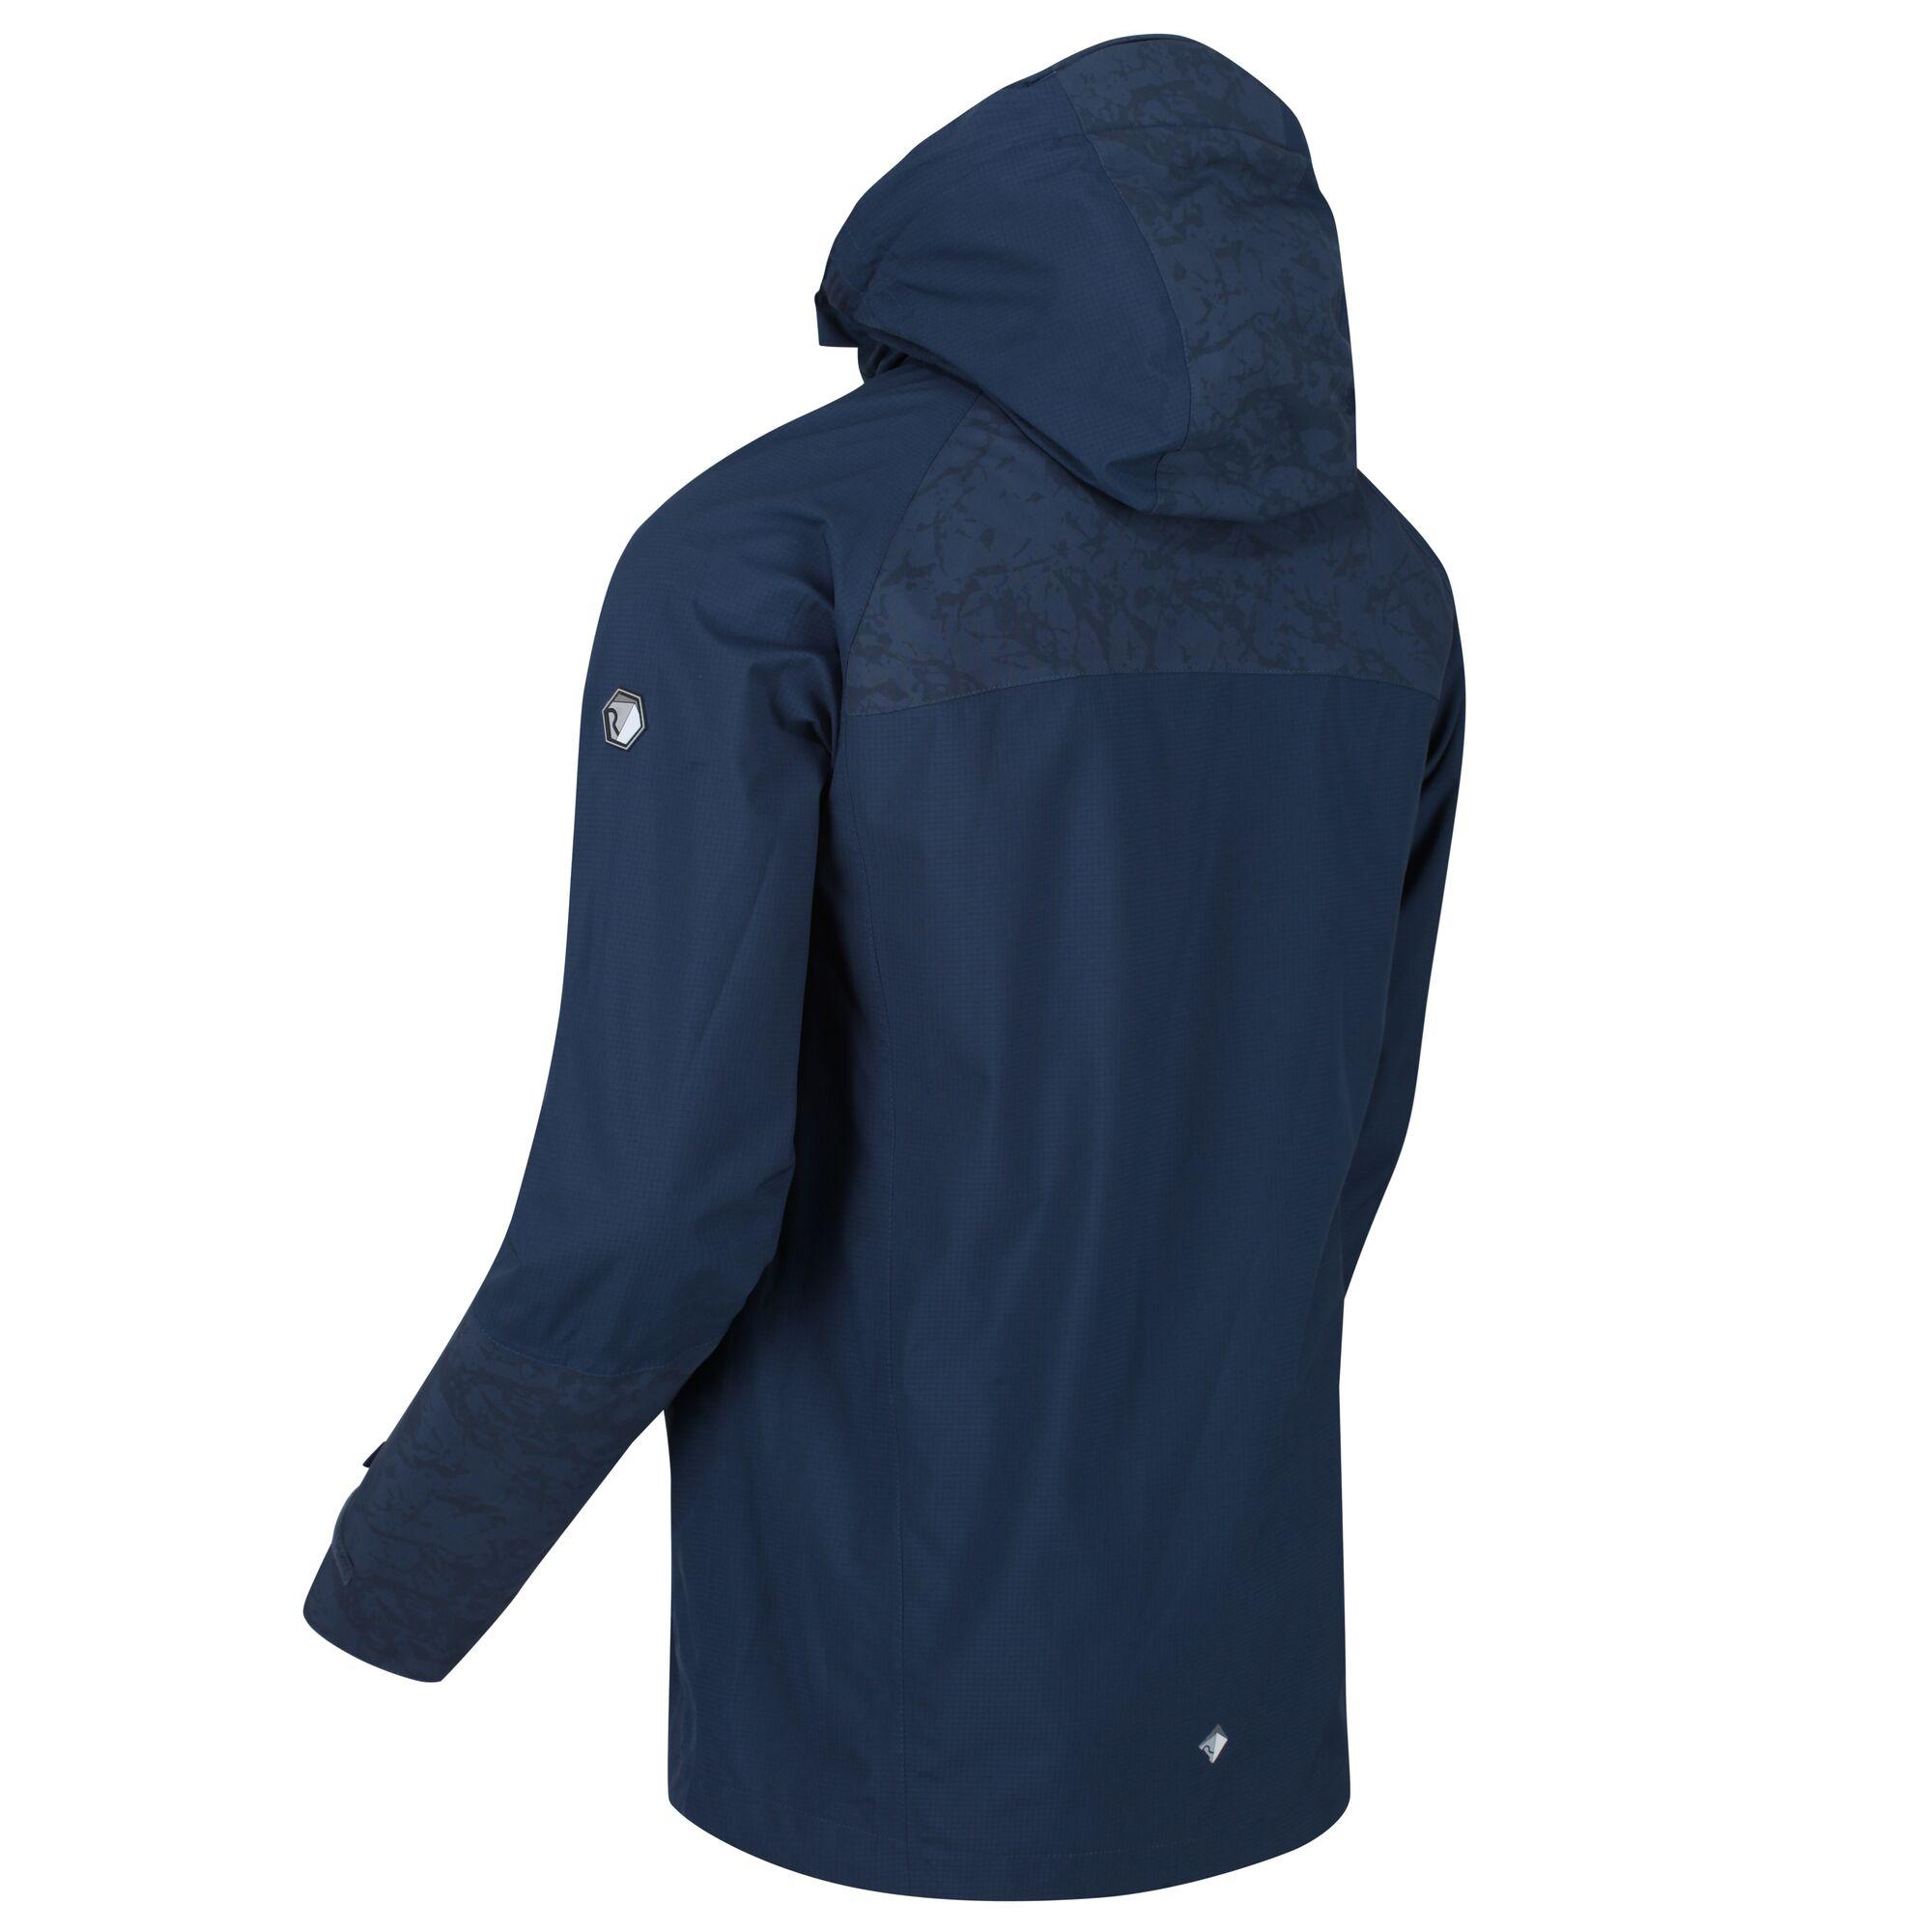 Regatta-Men-039-s-Oklahoma-V-Reflective-Waterproof-Hooded-Walking-Jacket-Blue thumbnail 10